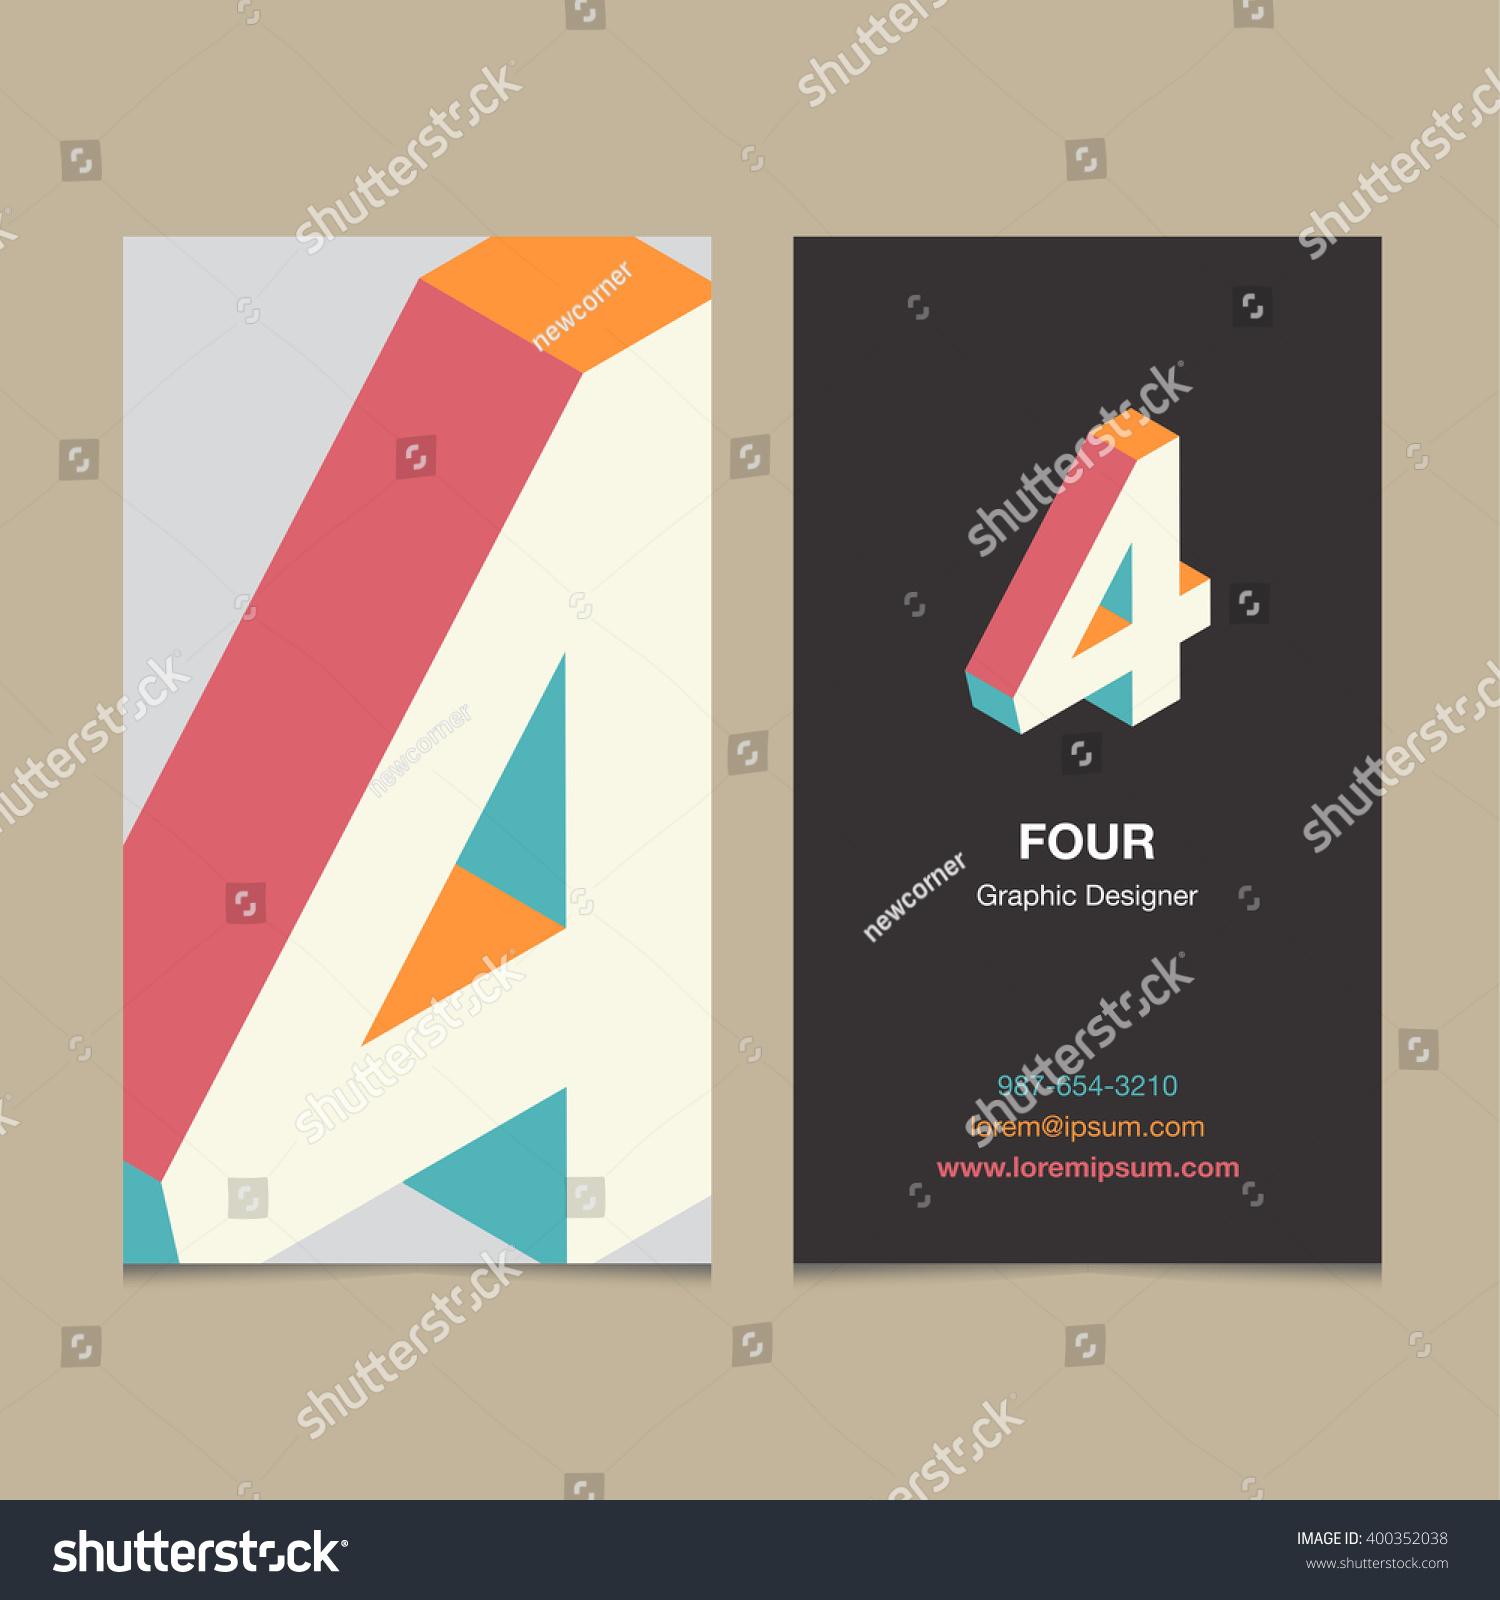 Vector graphic design business logo - Logo Number 4 With Business Card Template Vector Graphic Design Elements For